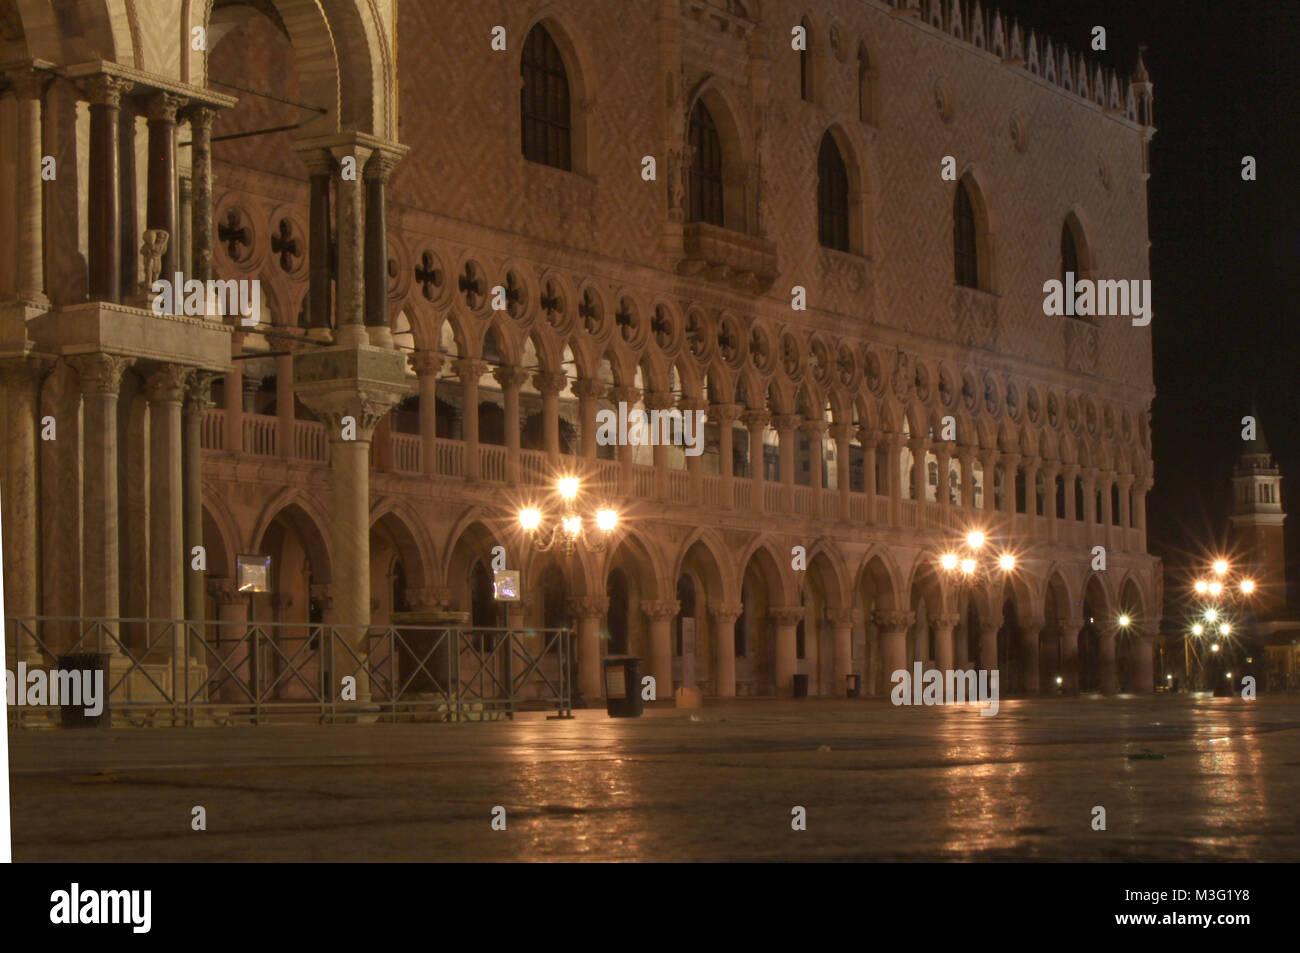 Venedig, Venice, Italien, Italy, Januar 2009, Nachtaufnahmen (Langzeitbelichtung), Markusplatz, Dogenpalast - Stock Image